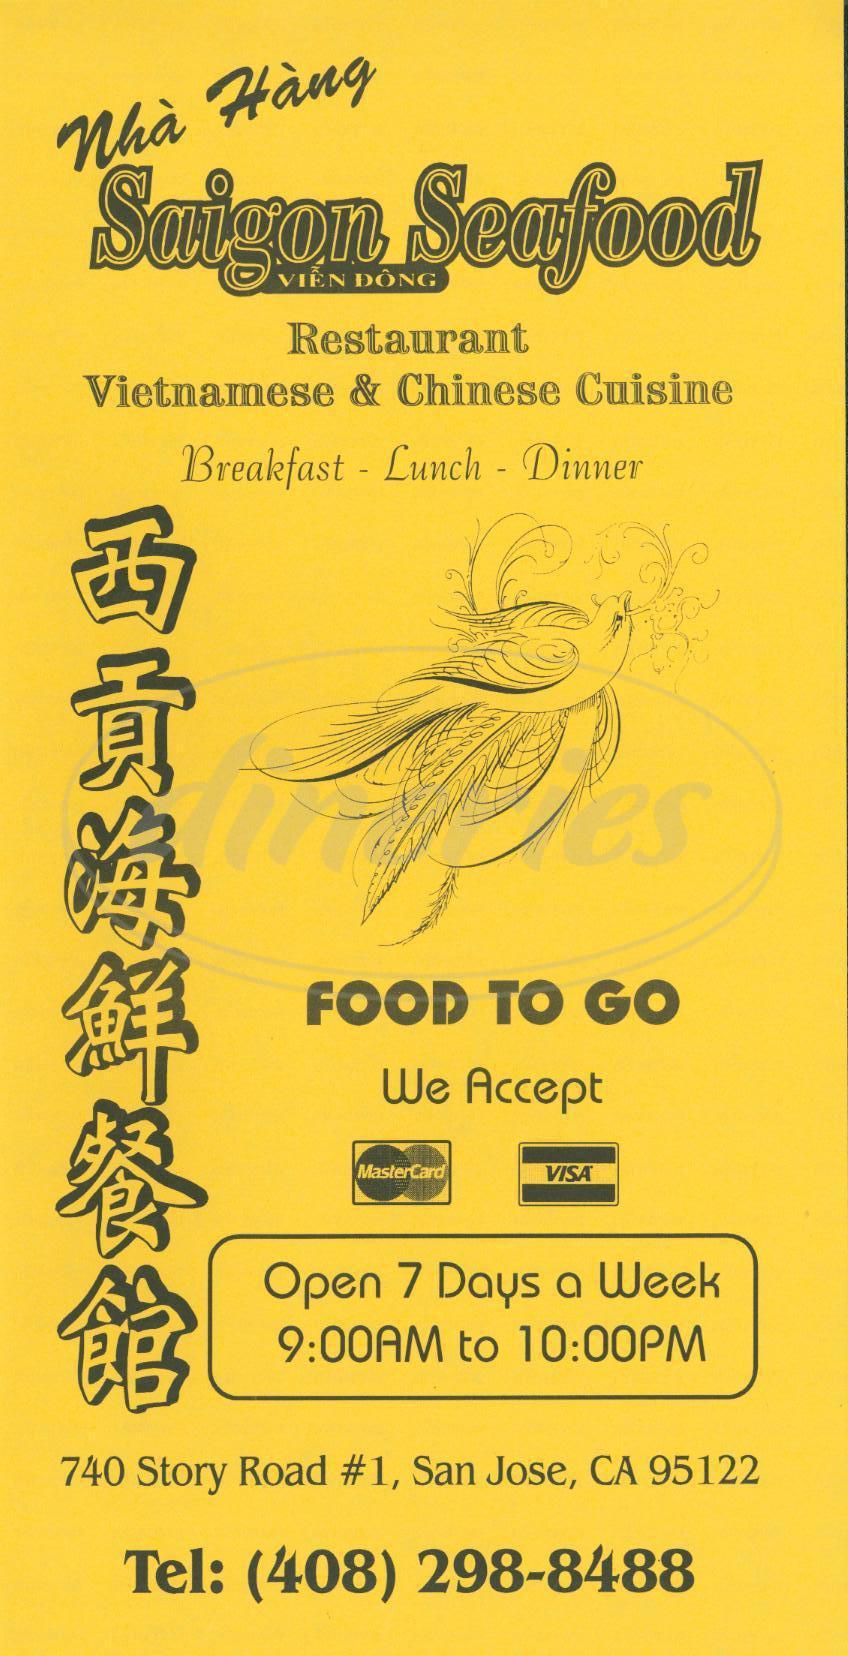 menu for Saigon Vien Dong